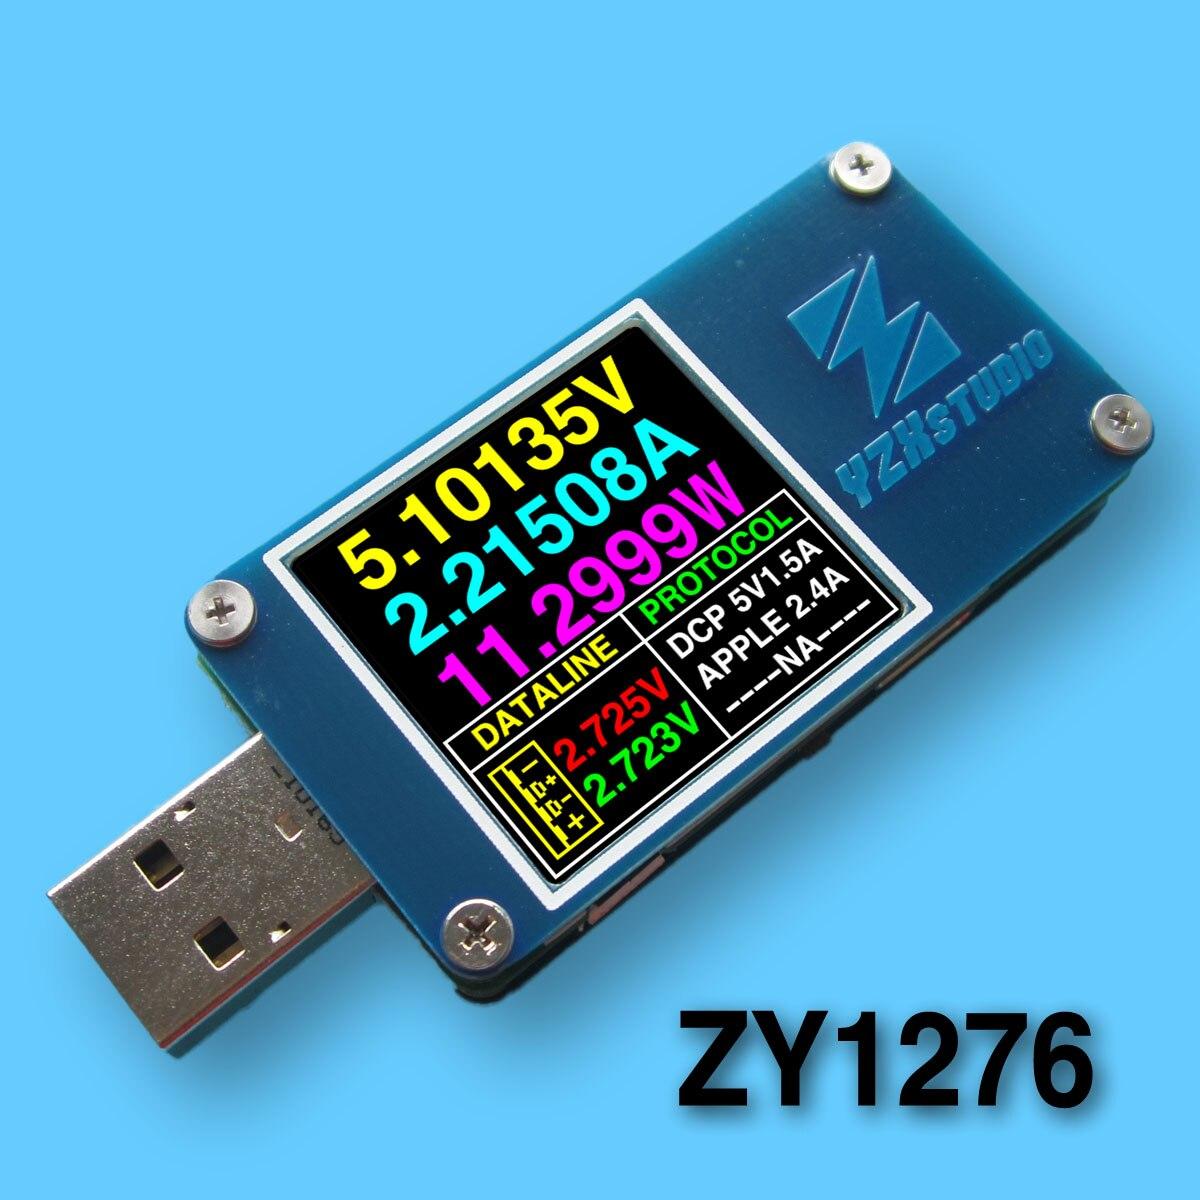 YZXstudio ZY1276 синий стол ZY1270 цветной стол USB PD TC тестер напряжения и емкости тока